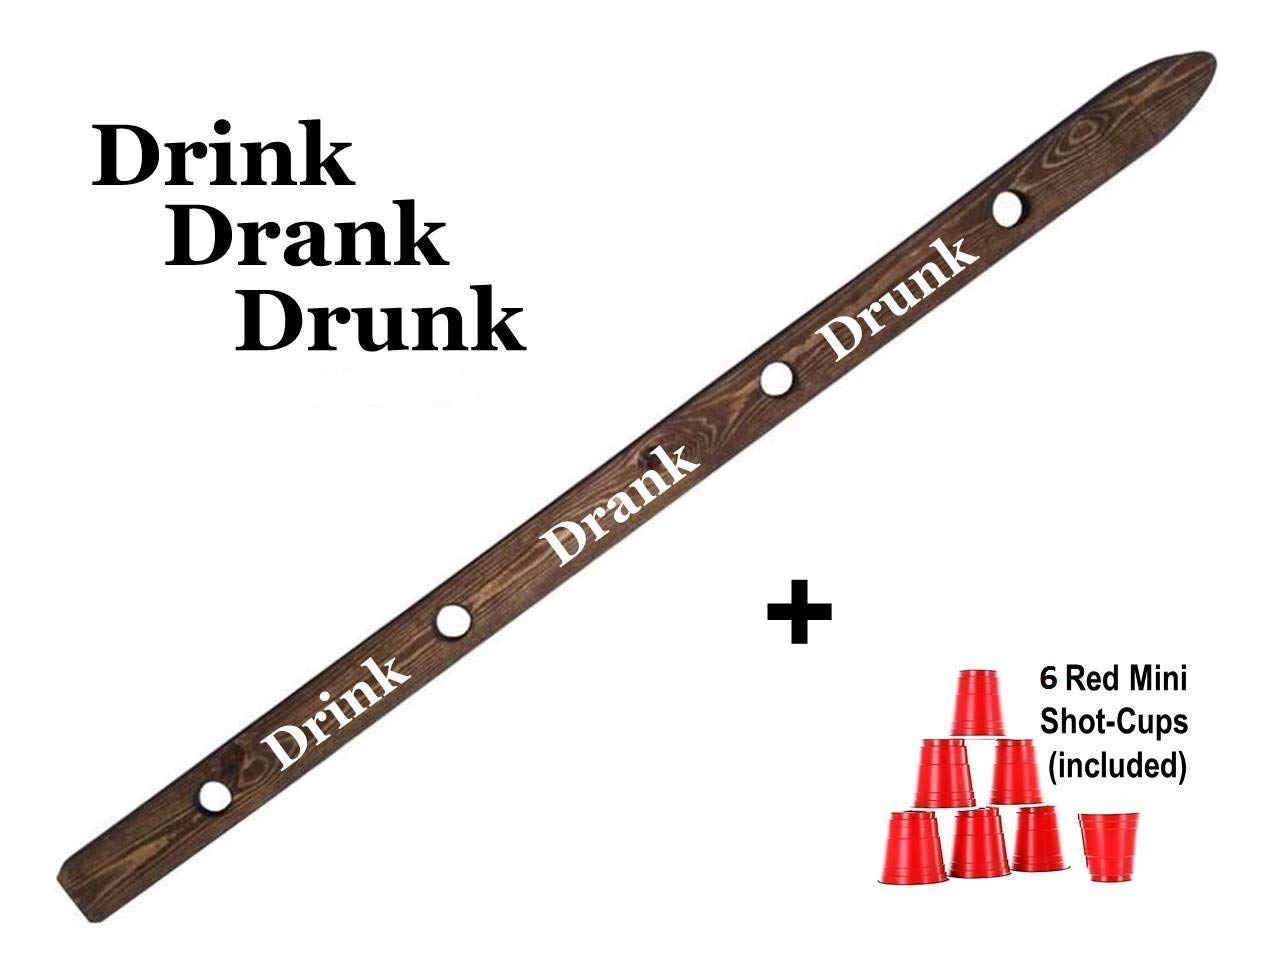 Drink Drank Drunk Shot Board Drinking Game